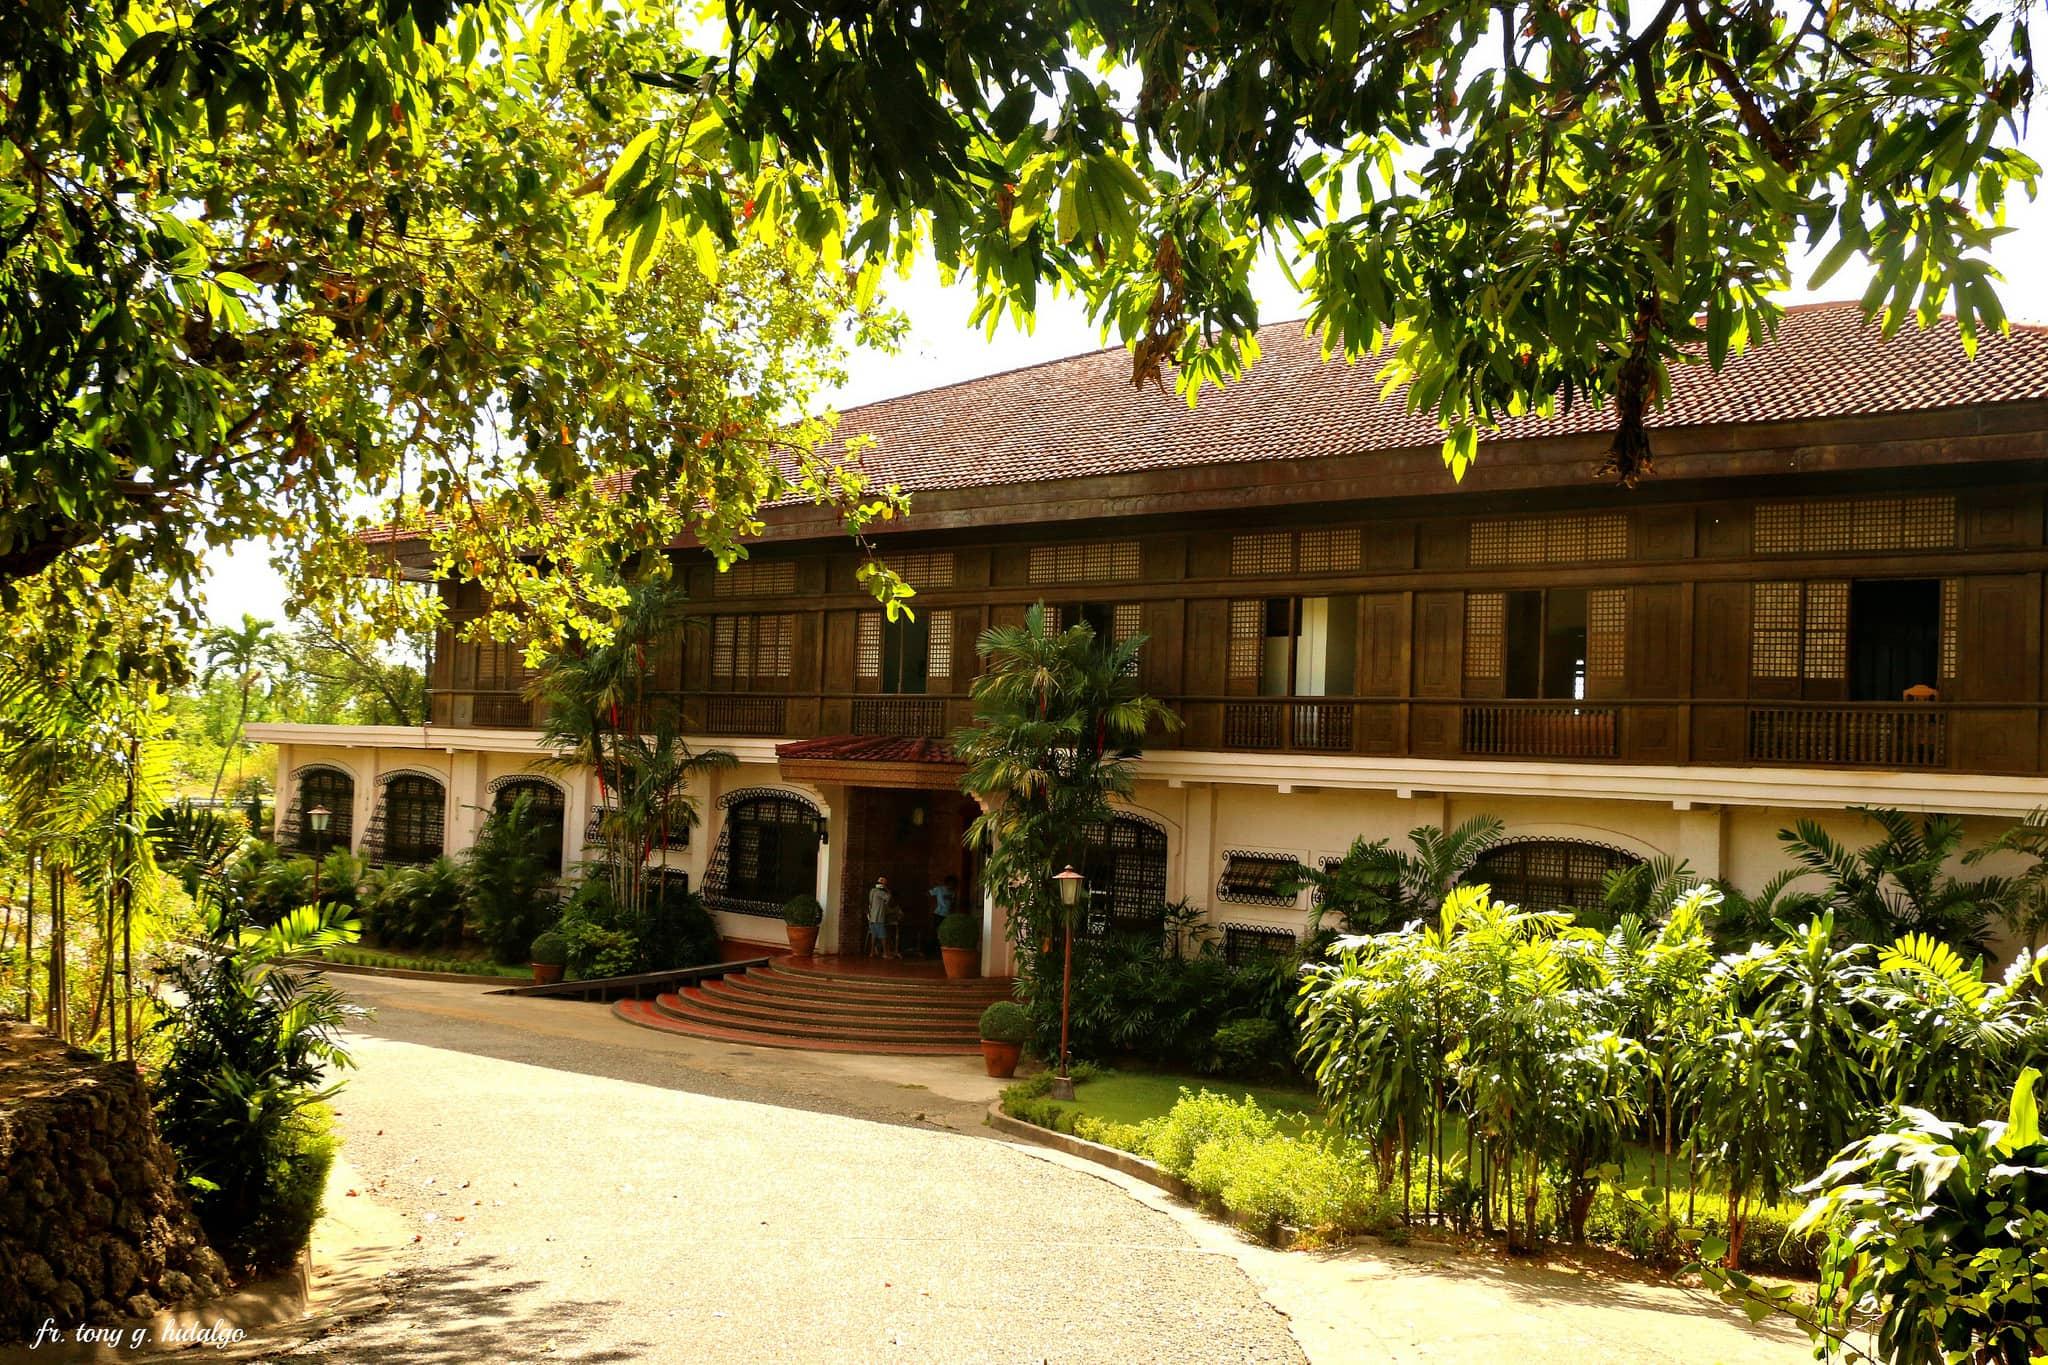 Ilocos Norte tourist spots, Malacanang Ti Amianan, things to do in Laoag, tourist spots in Ilocos Norte